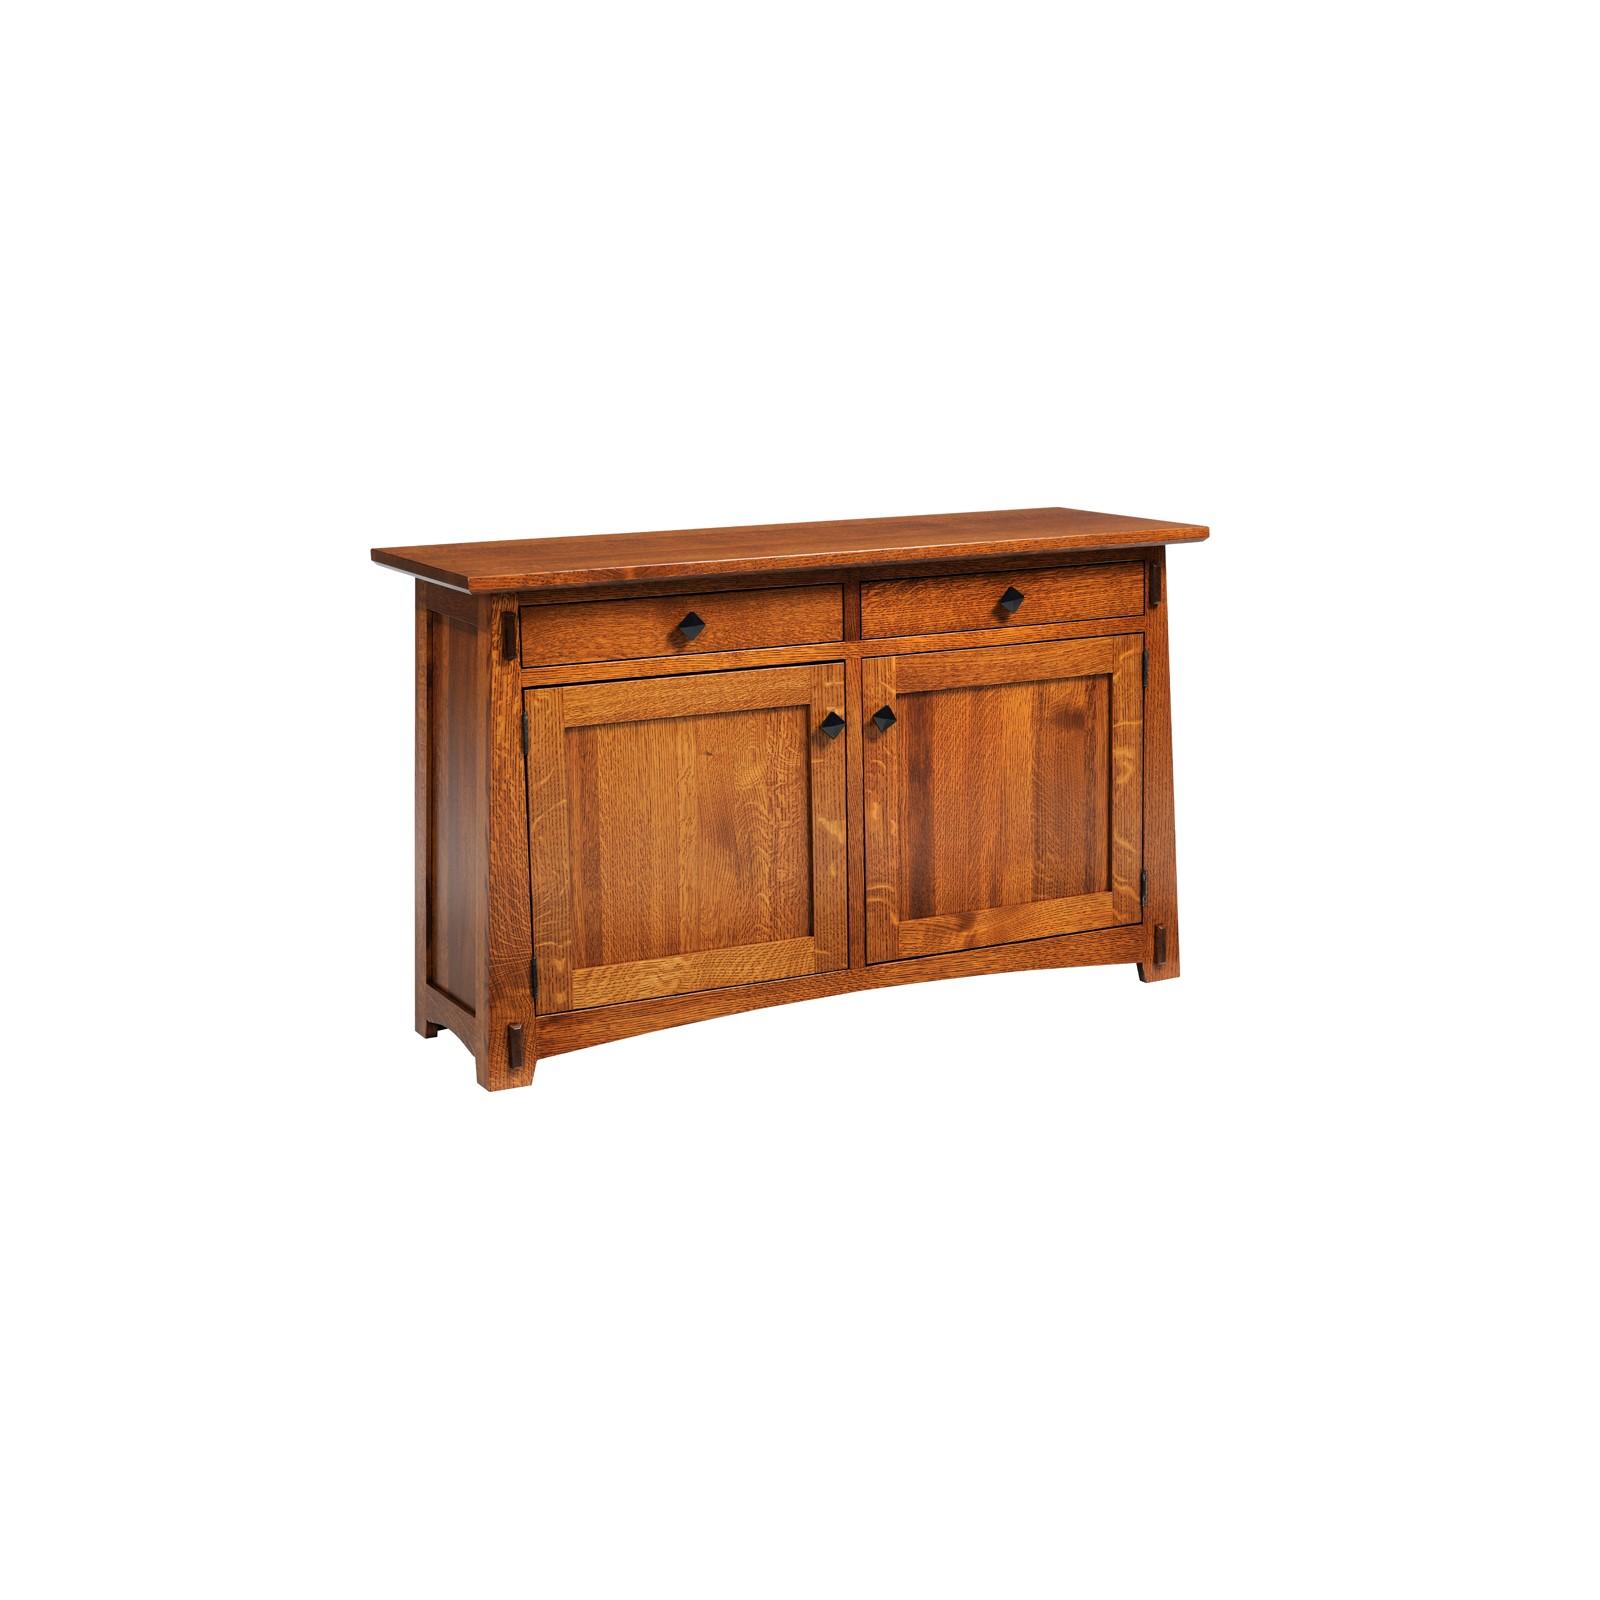 arts crafts chocolate sofa table. Black Bedroom Furniture Sets. Home Design Ideas